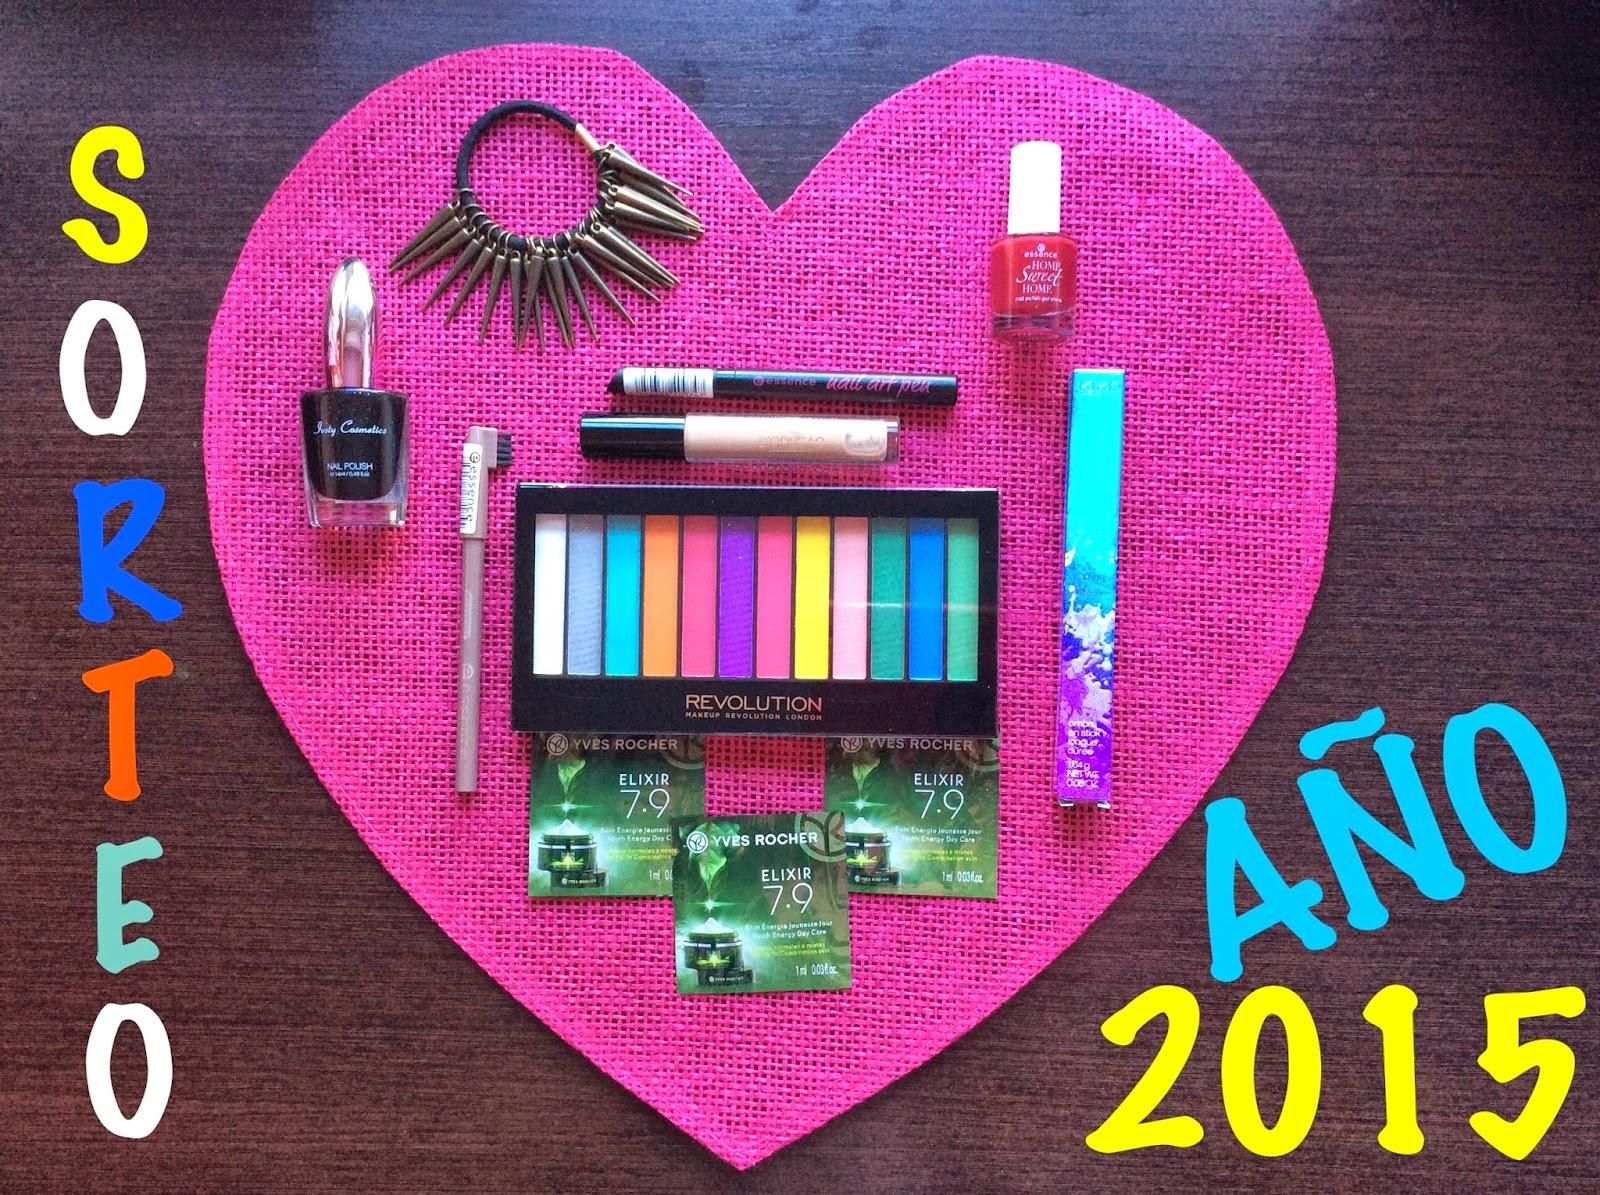 ¡¡¡ SORTEO 2015 !!!